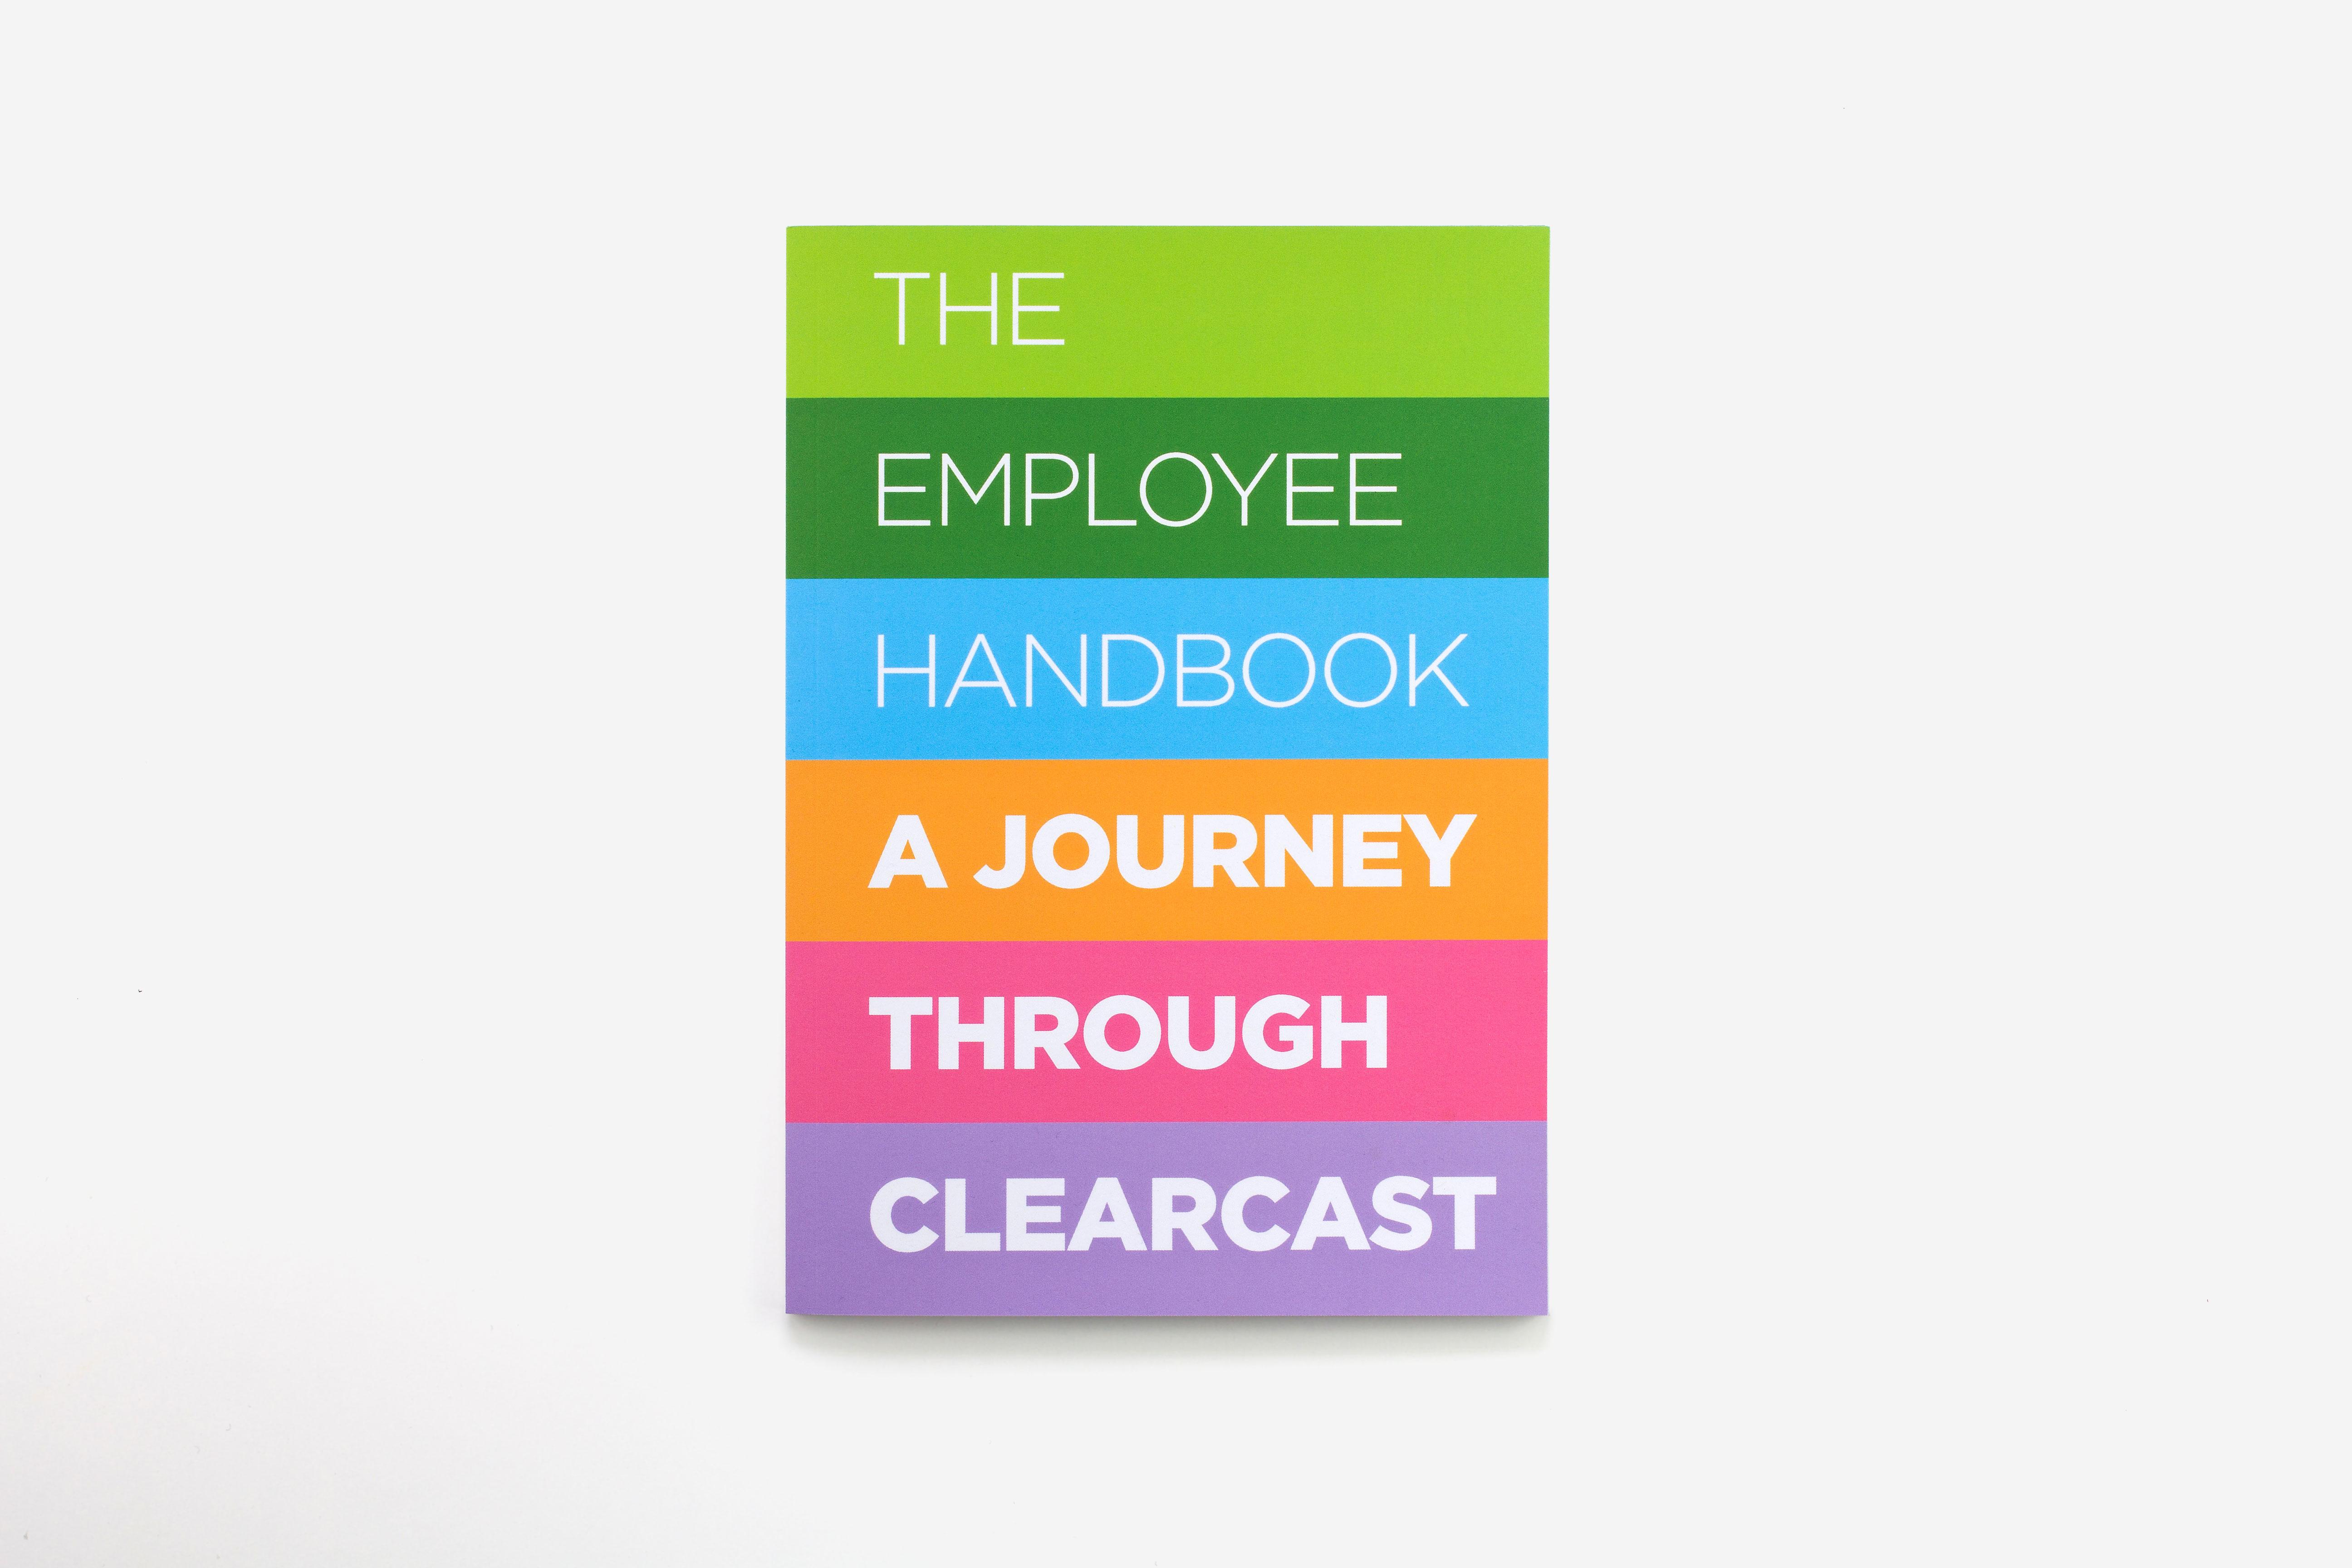 Clearcast_handbook